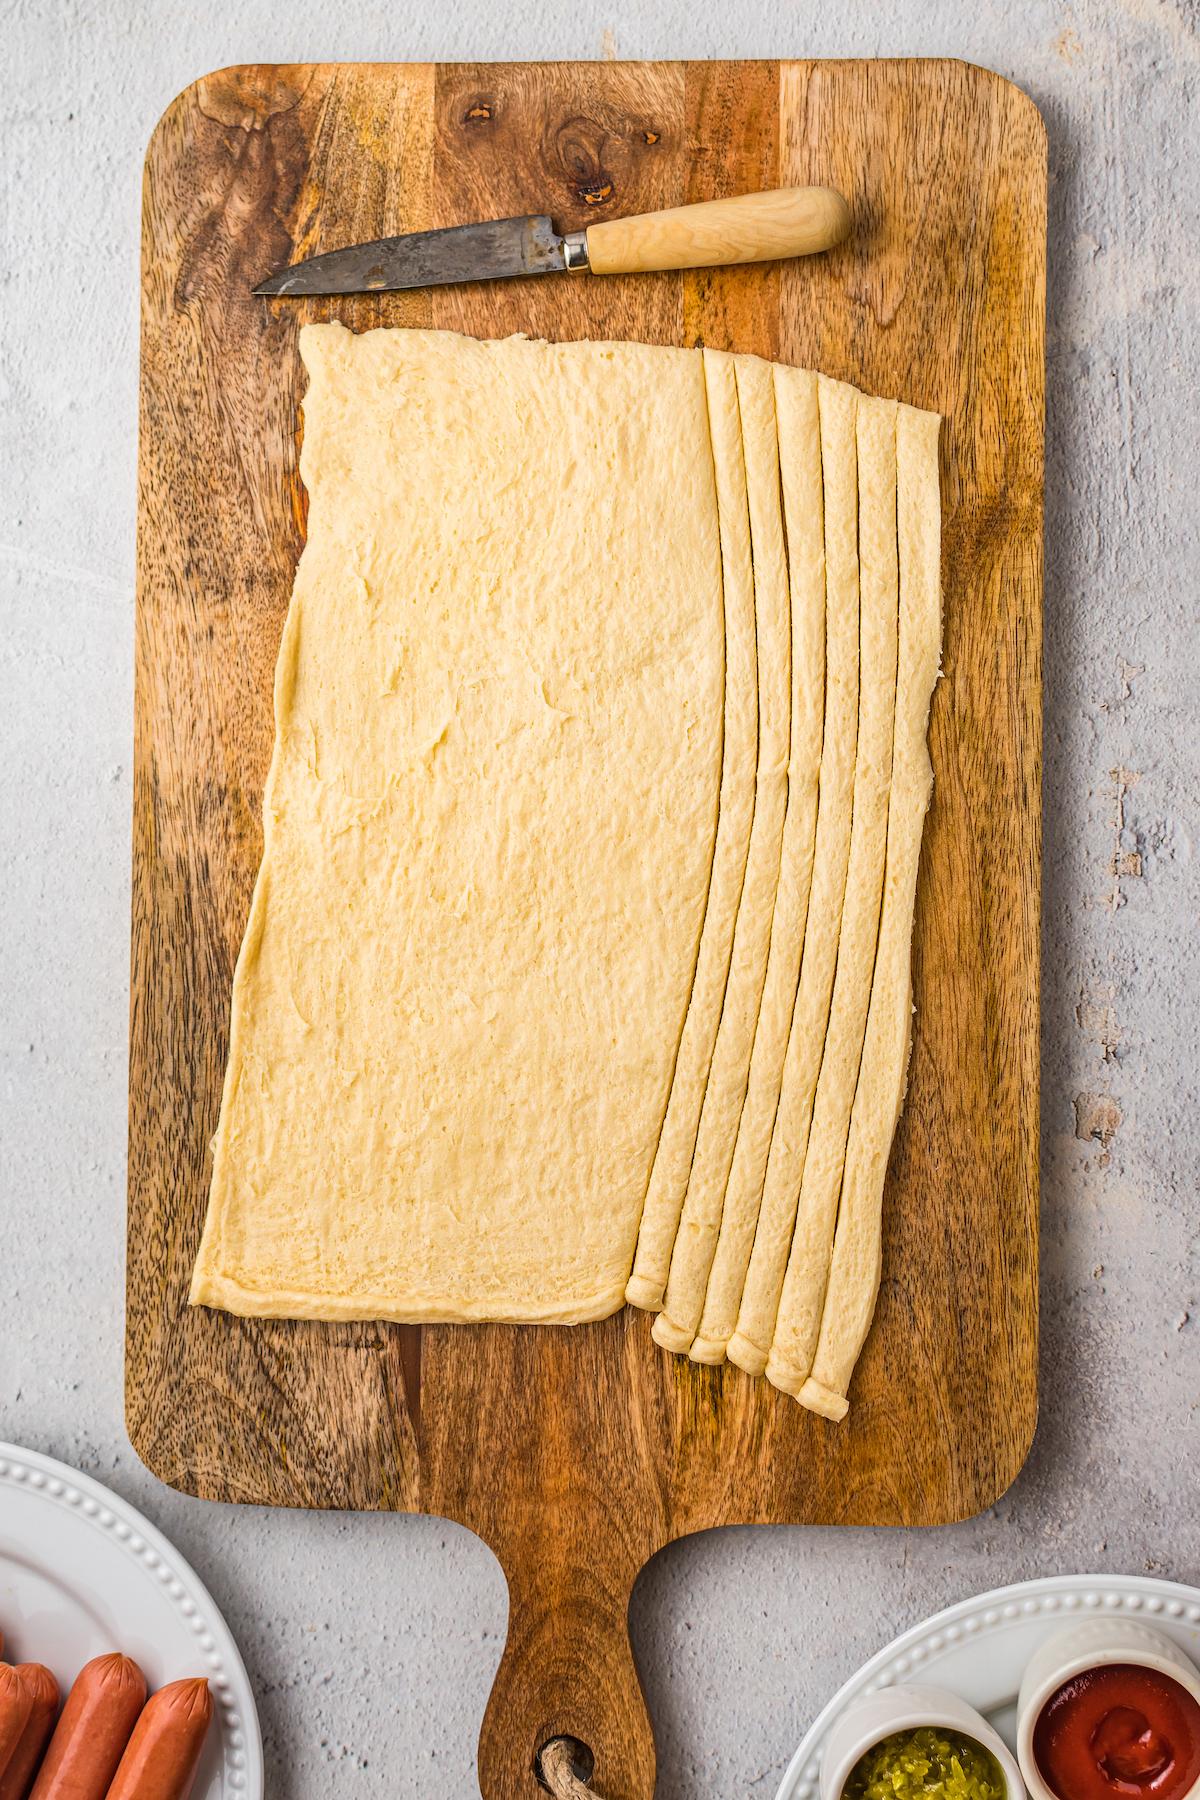 Crescent dough cut into strips.